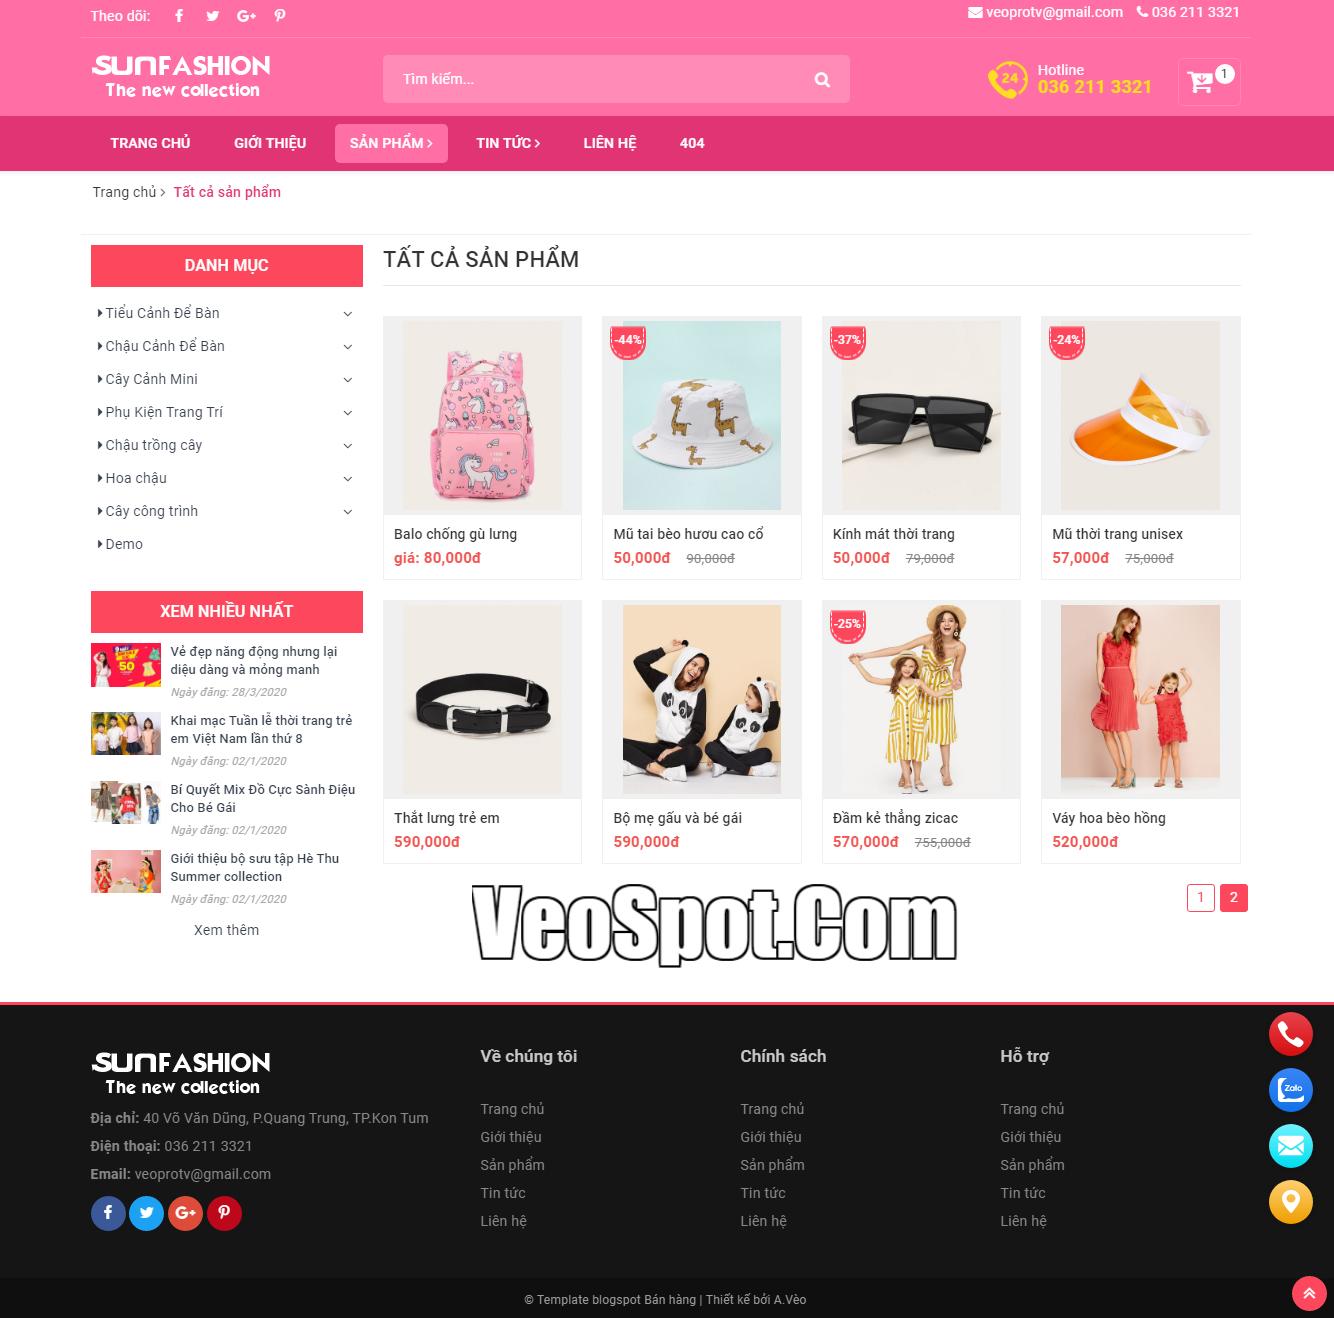 Template Blogspot SunFasun trang Nhãn (Label sản phẩm)